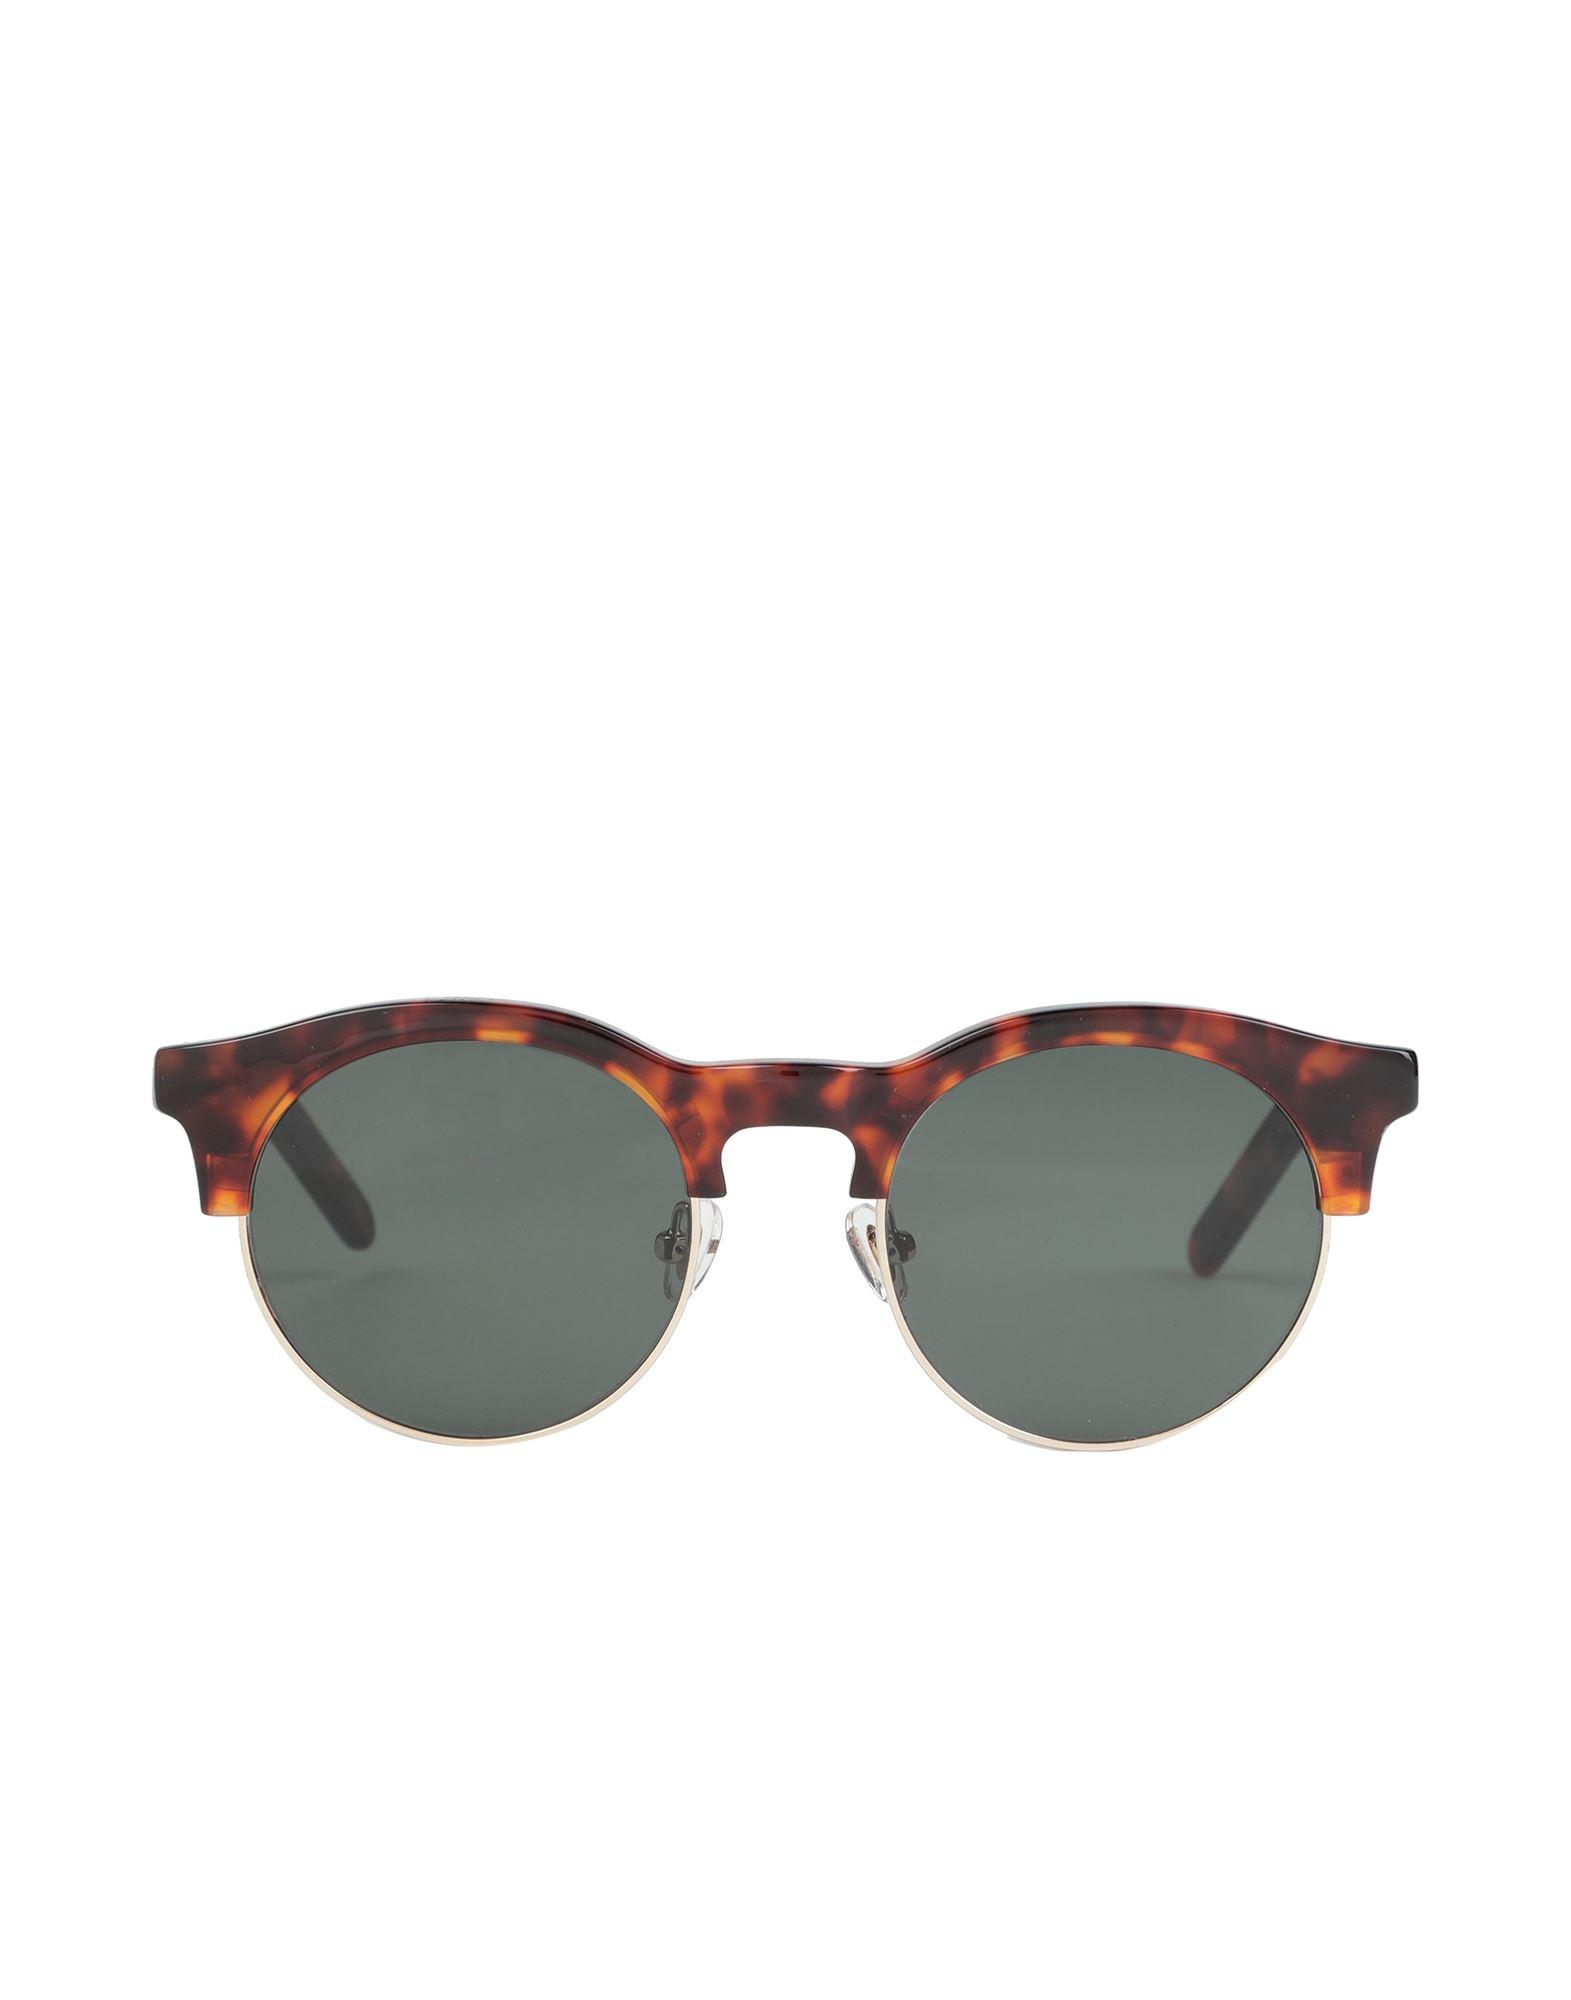 HAN KJØBENHAVN Sunglasses - Item 46737548